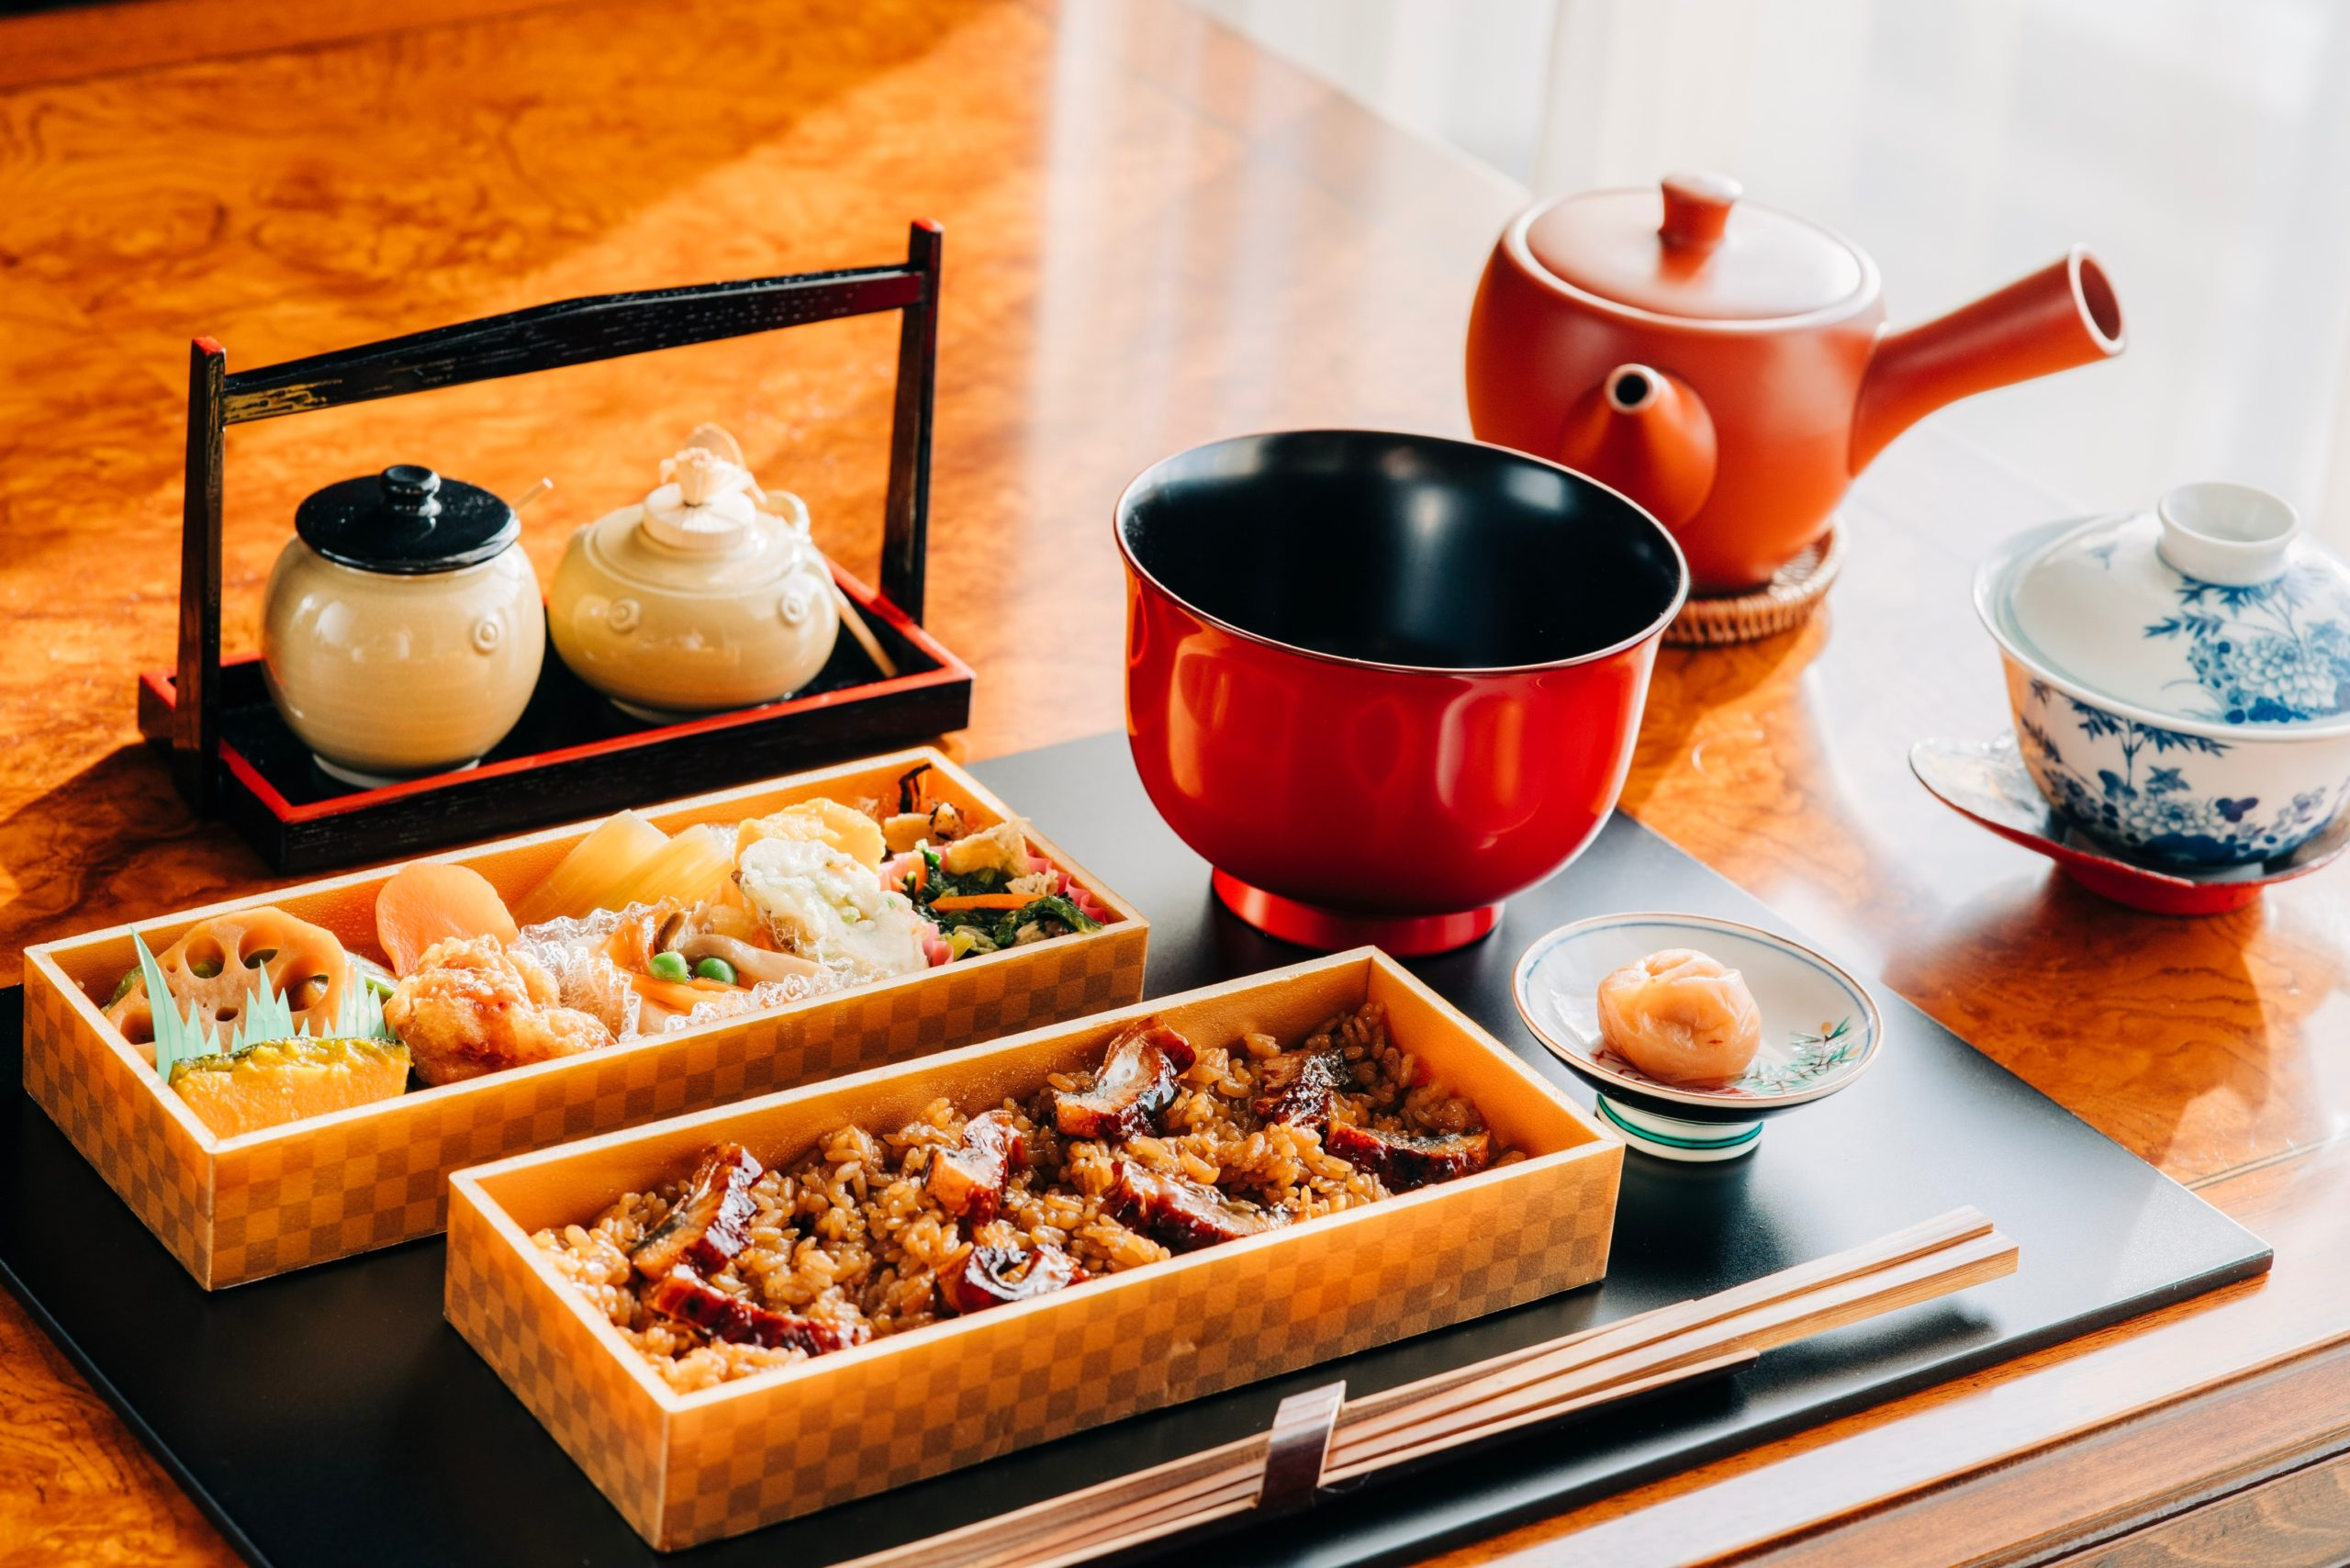 noshの宅食「10食限定」送料含め完全無料でお届け【休校支援サービス】